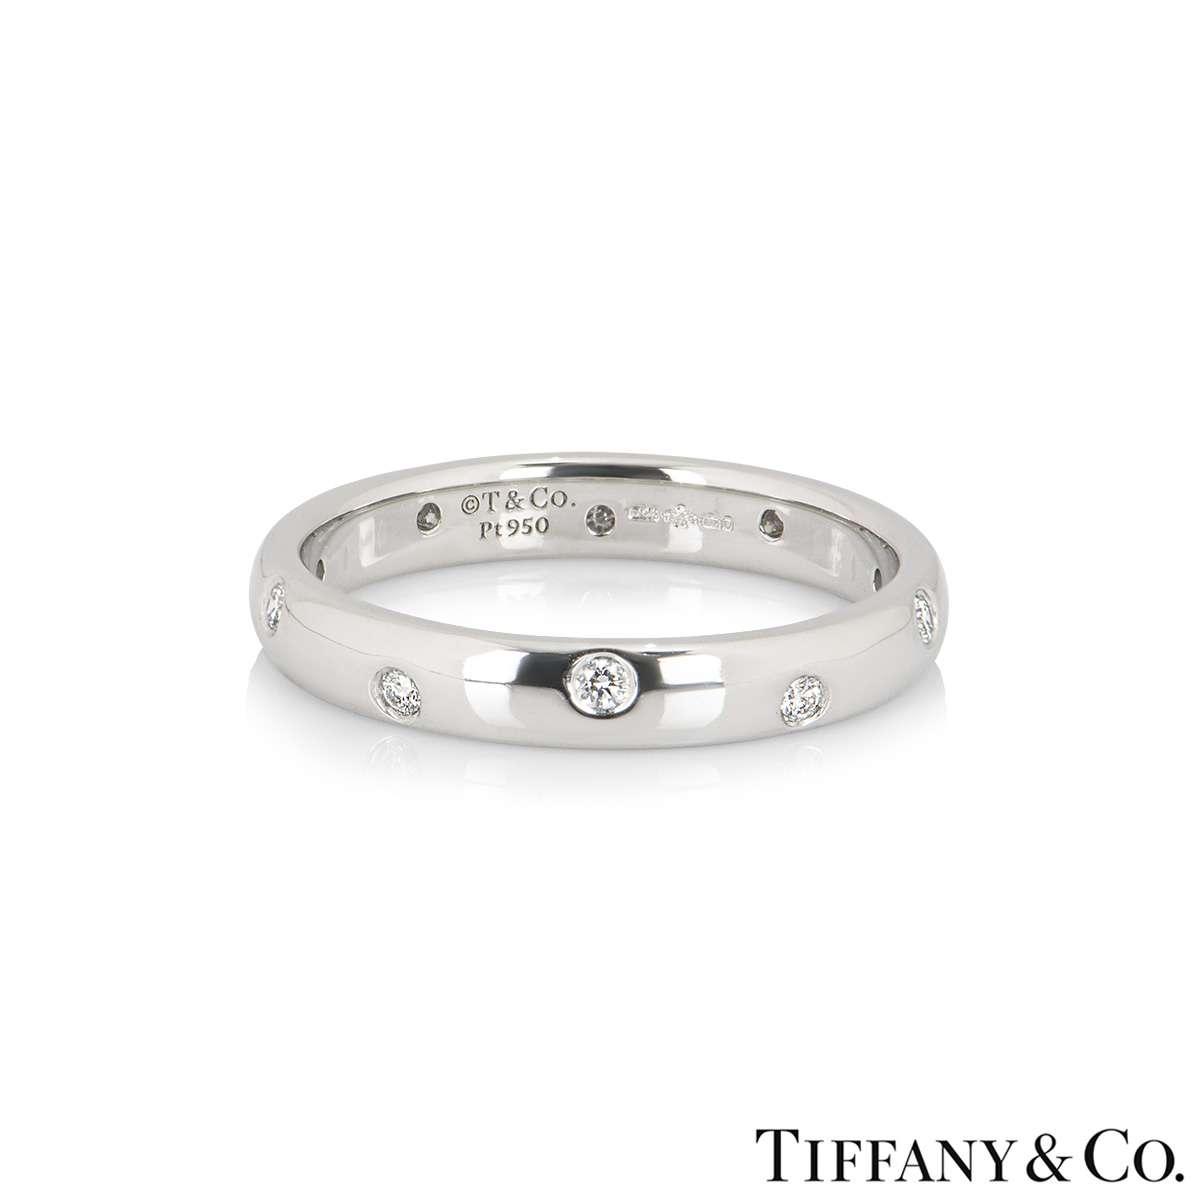 Tiffany & Co. Platinum Etoile Diamond Ring